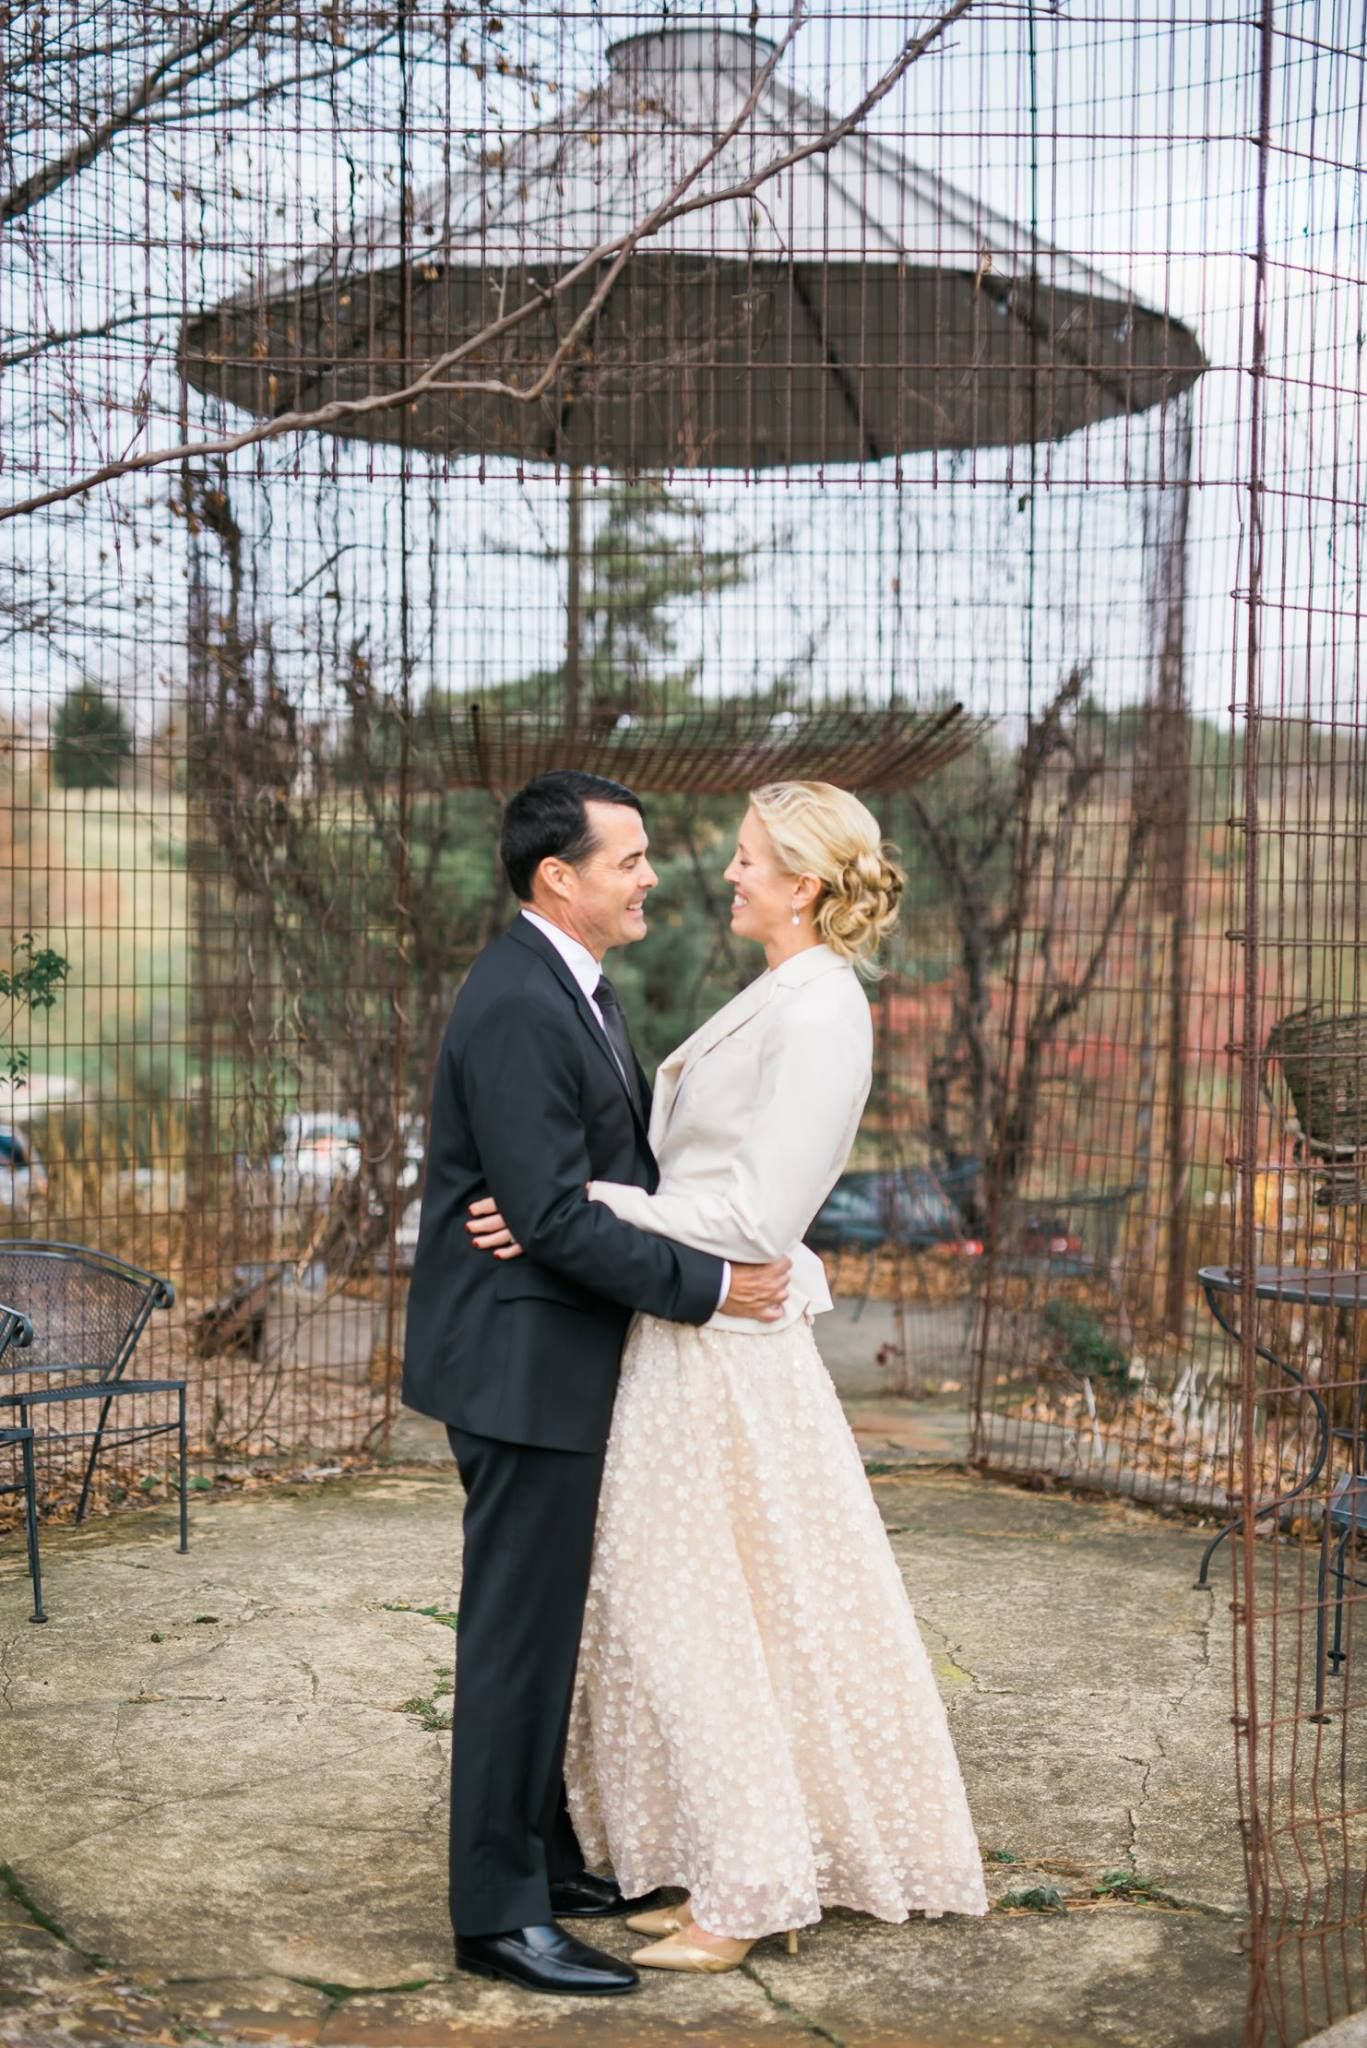 Rustic Wedding | Nature Wedding | Destination Wedding ...